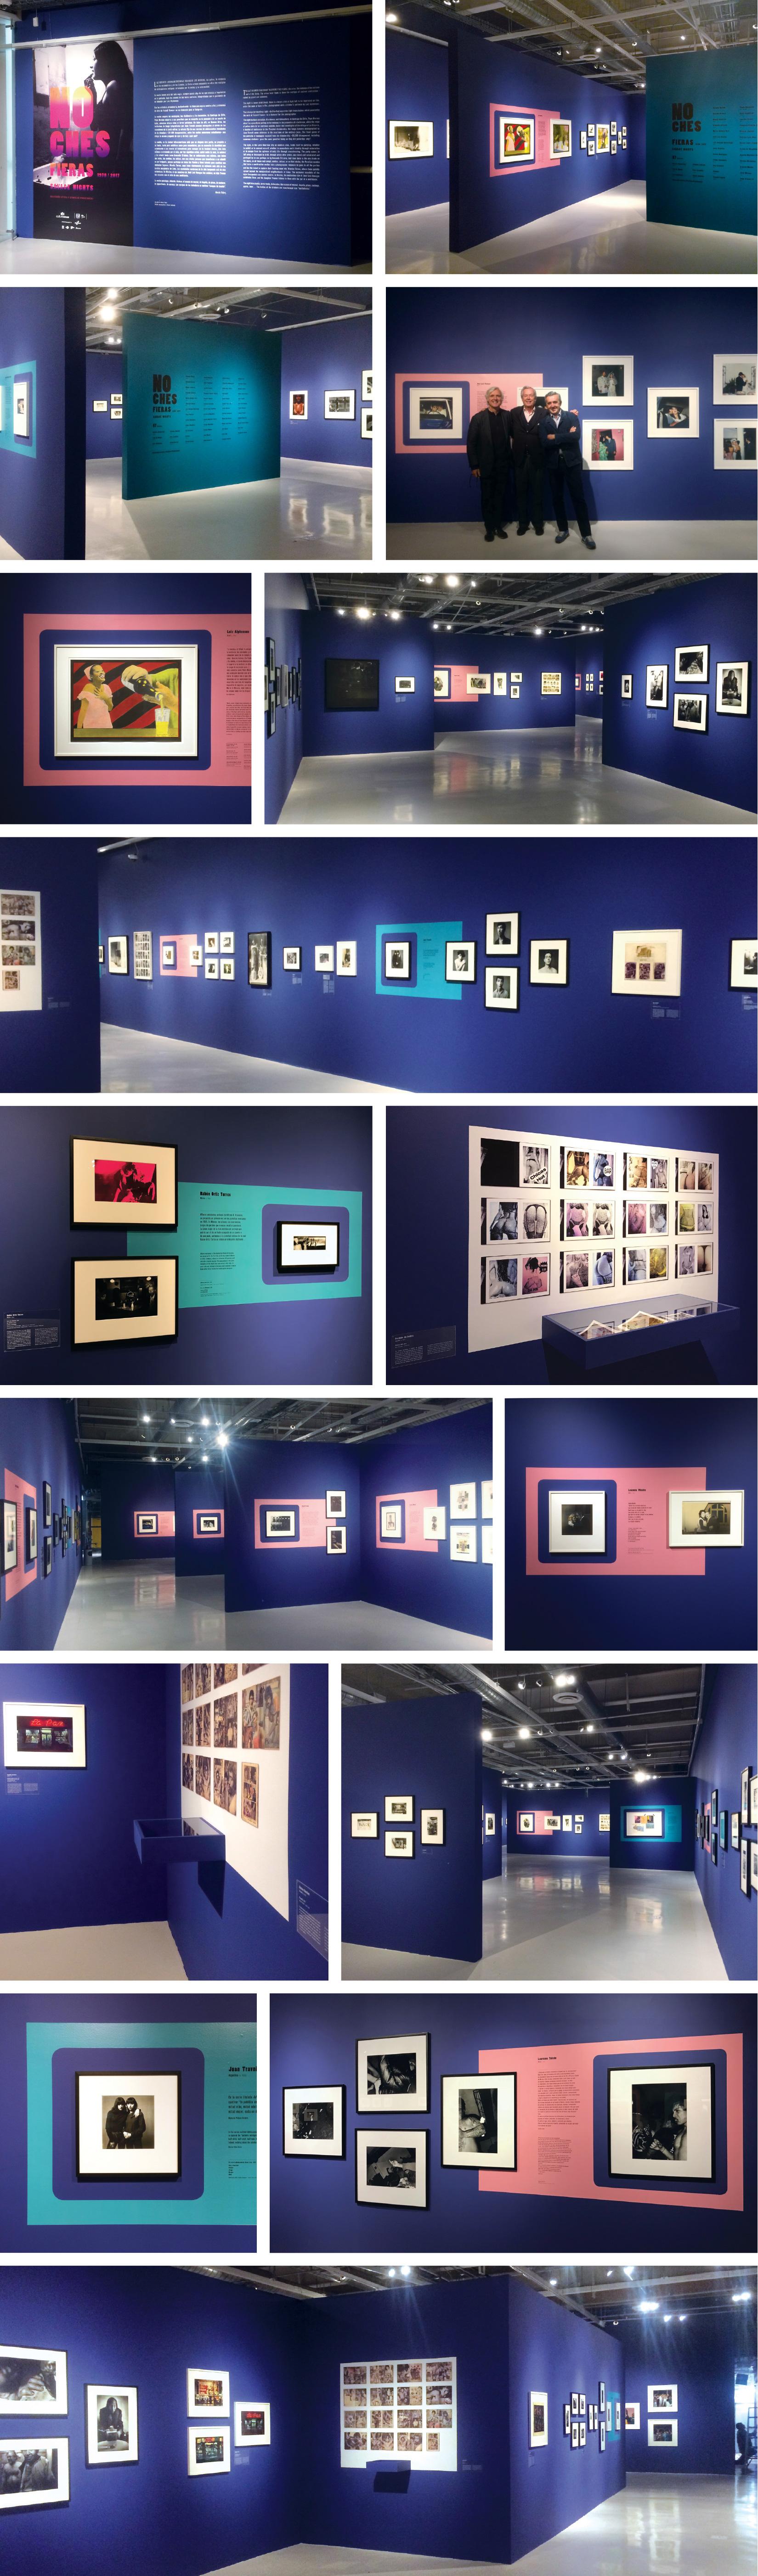 noches-fieras-toluca-studio-olivier-andreotti-expo.jpg